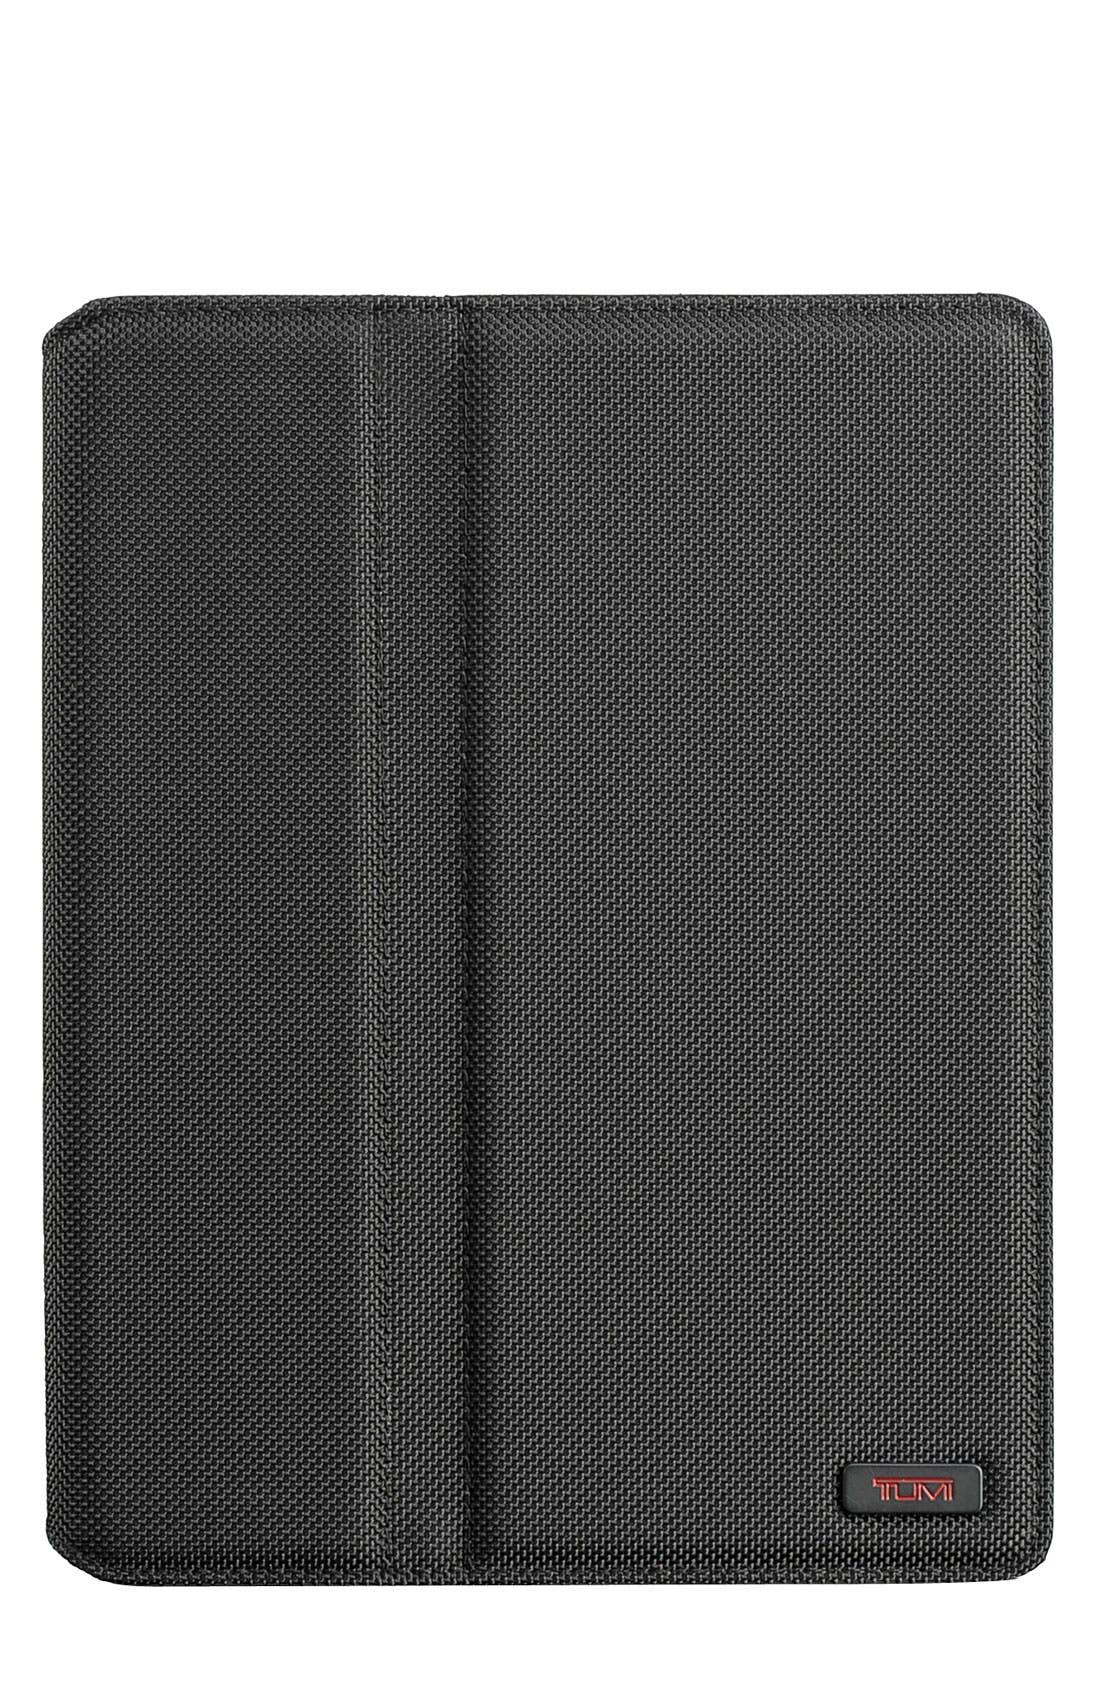 Ballistic Nylon iPad 2 Cover,                             Main thumbnail 1, color,                             007